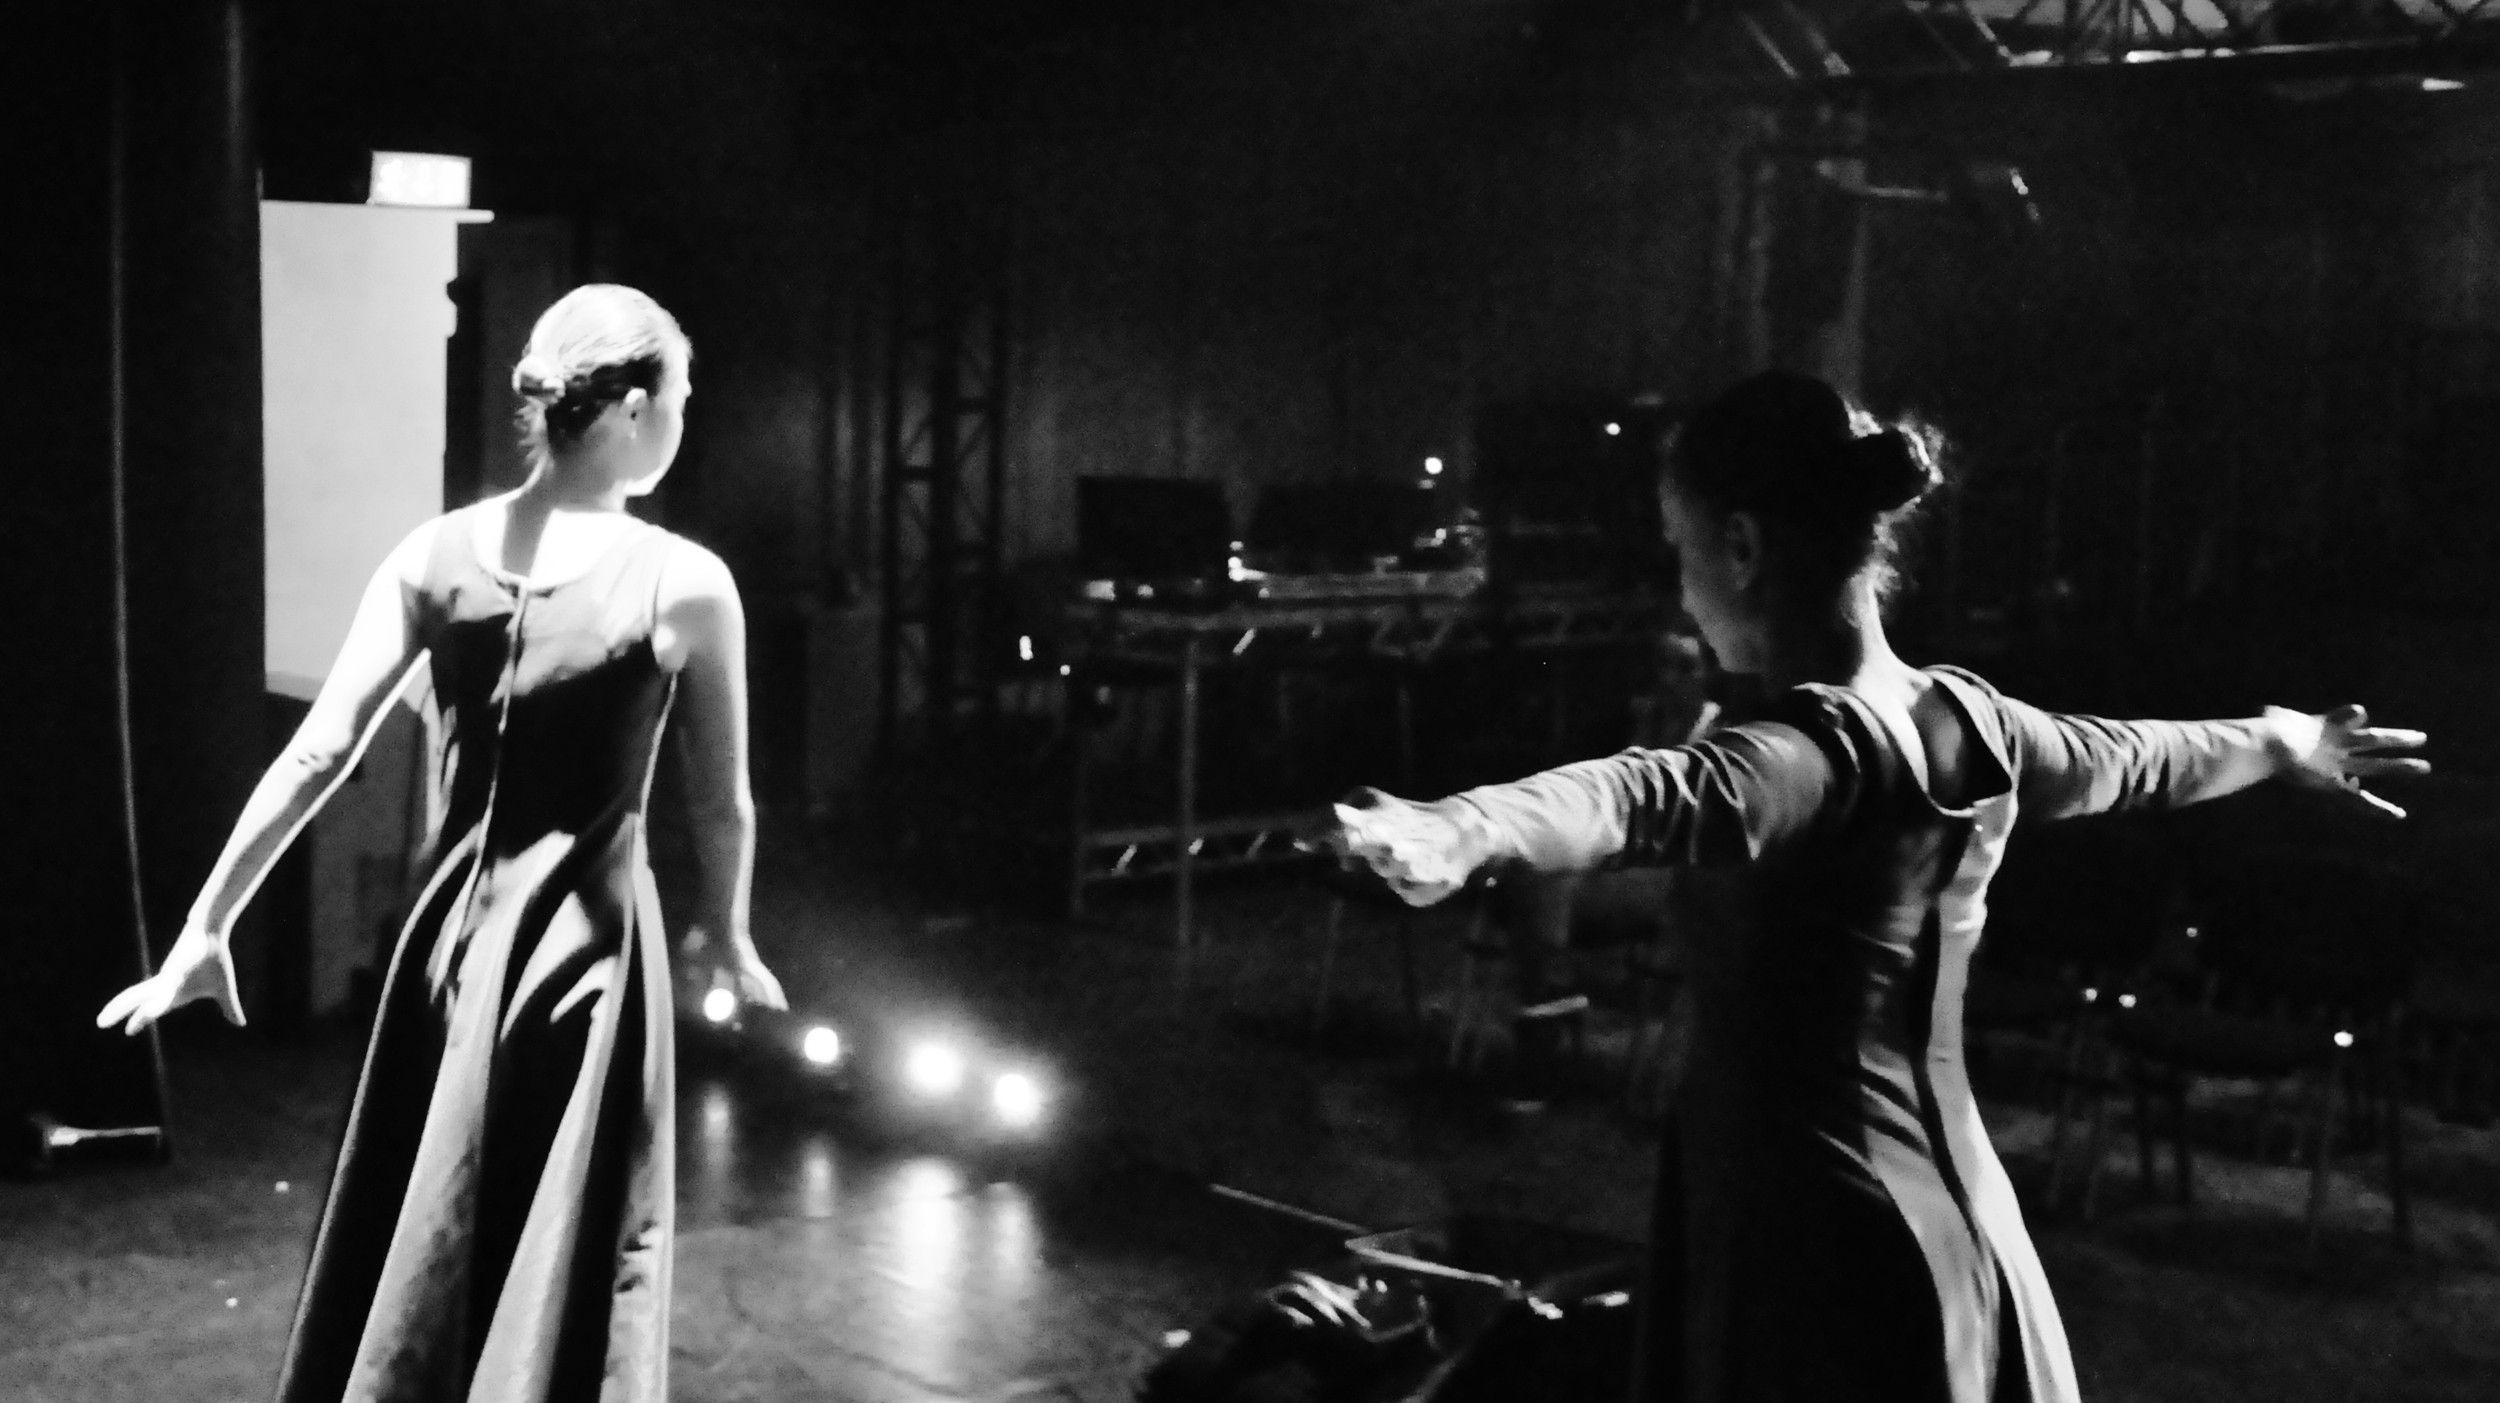 ©Stuart Walton: Image from Amina Khayyam Dance Company's Yerma